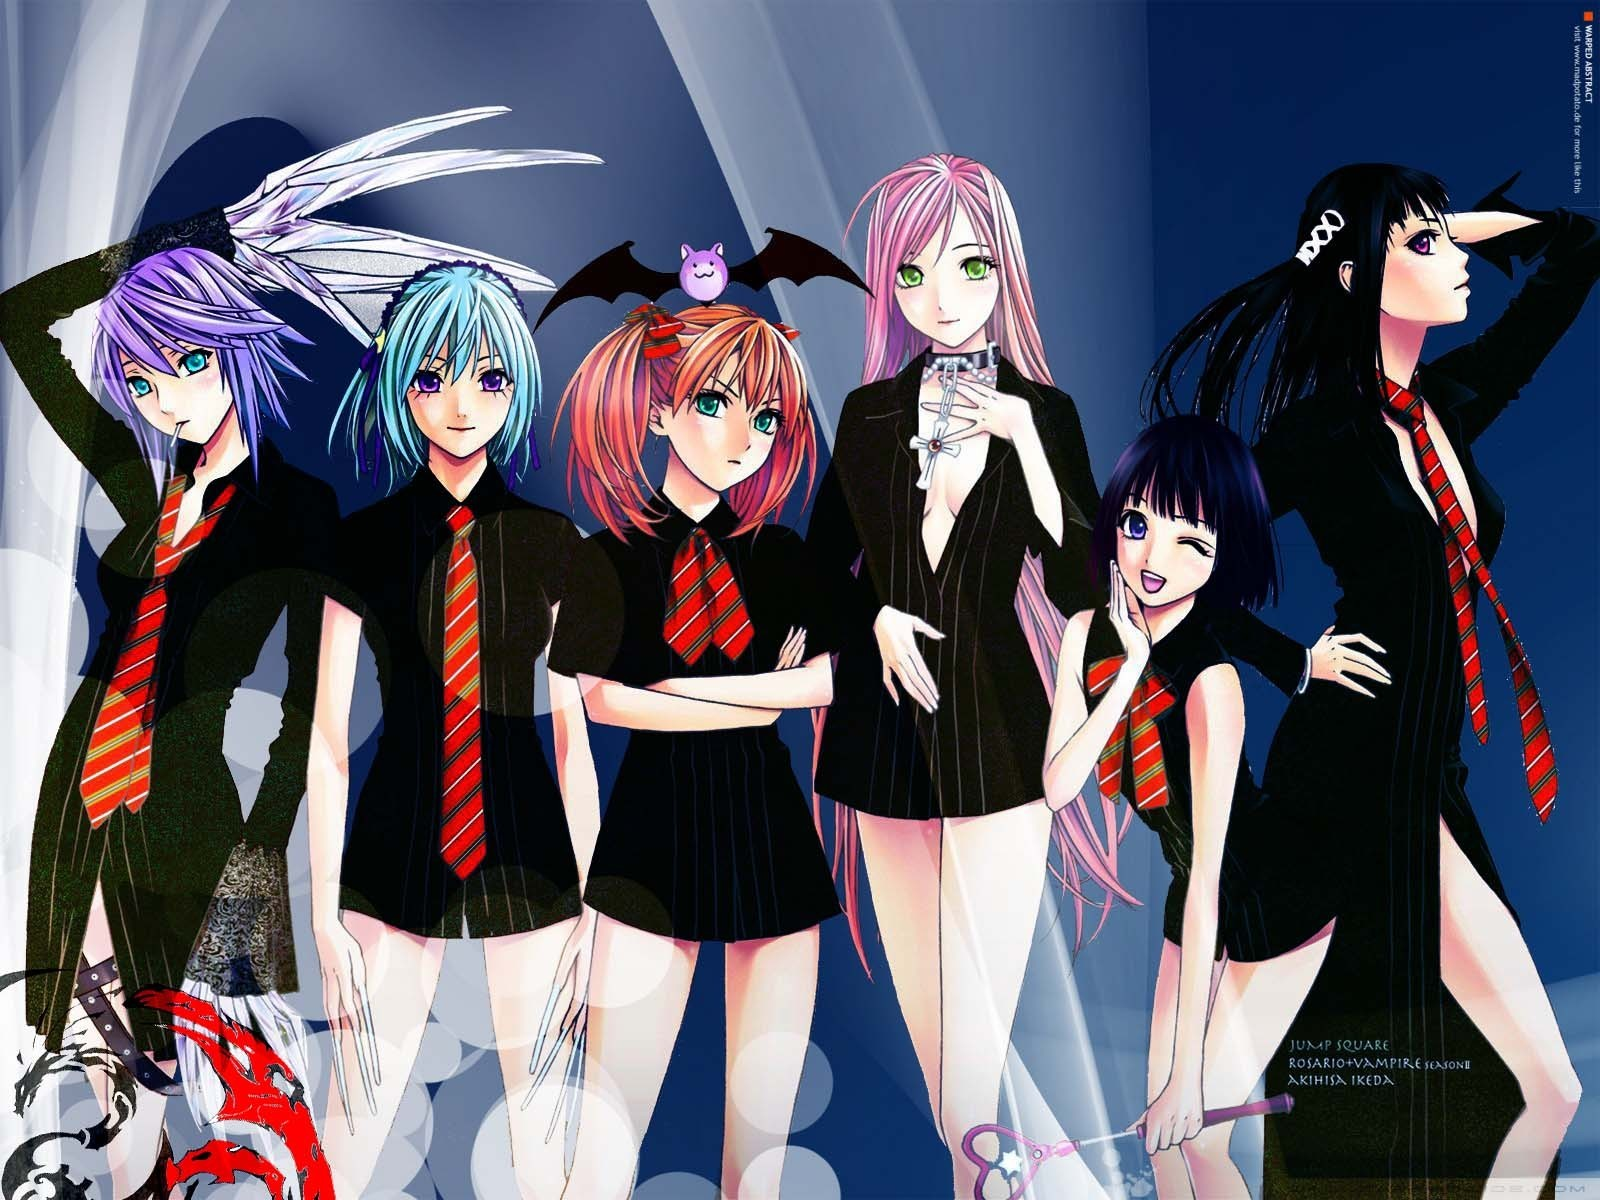 Anime De Rosario Vampire nerdilista neda: anime review sunday: rosario + vampire